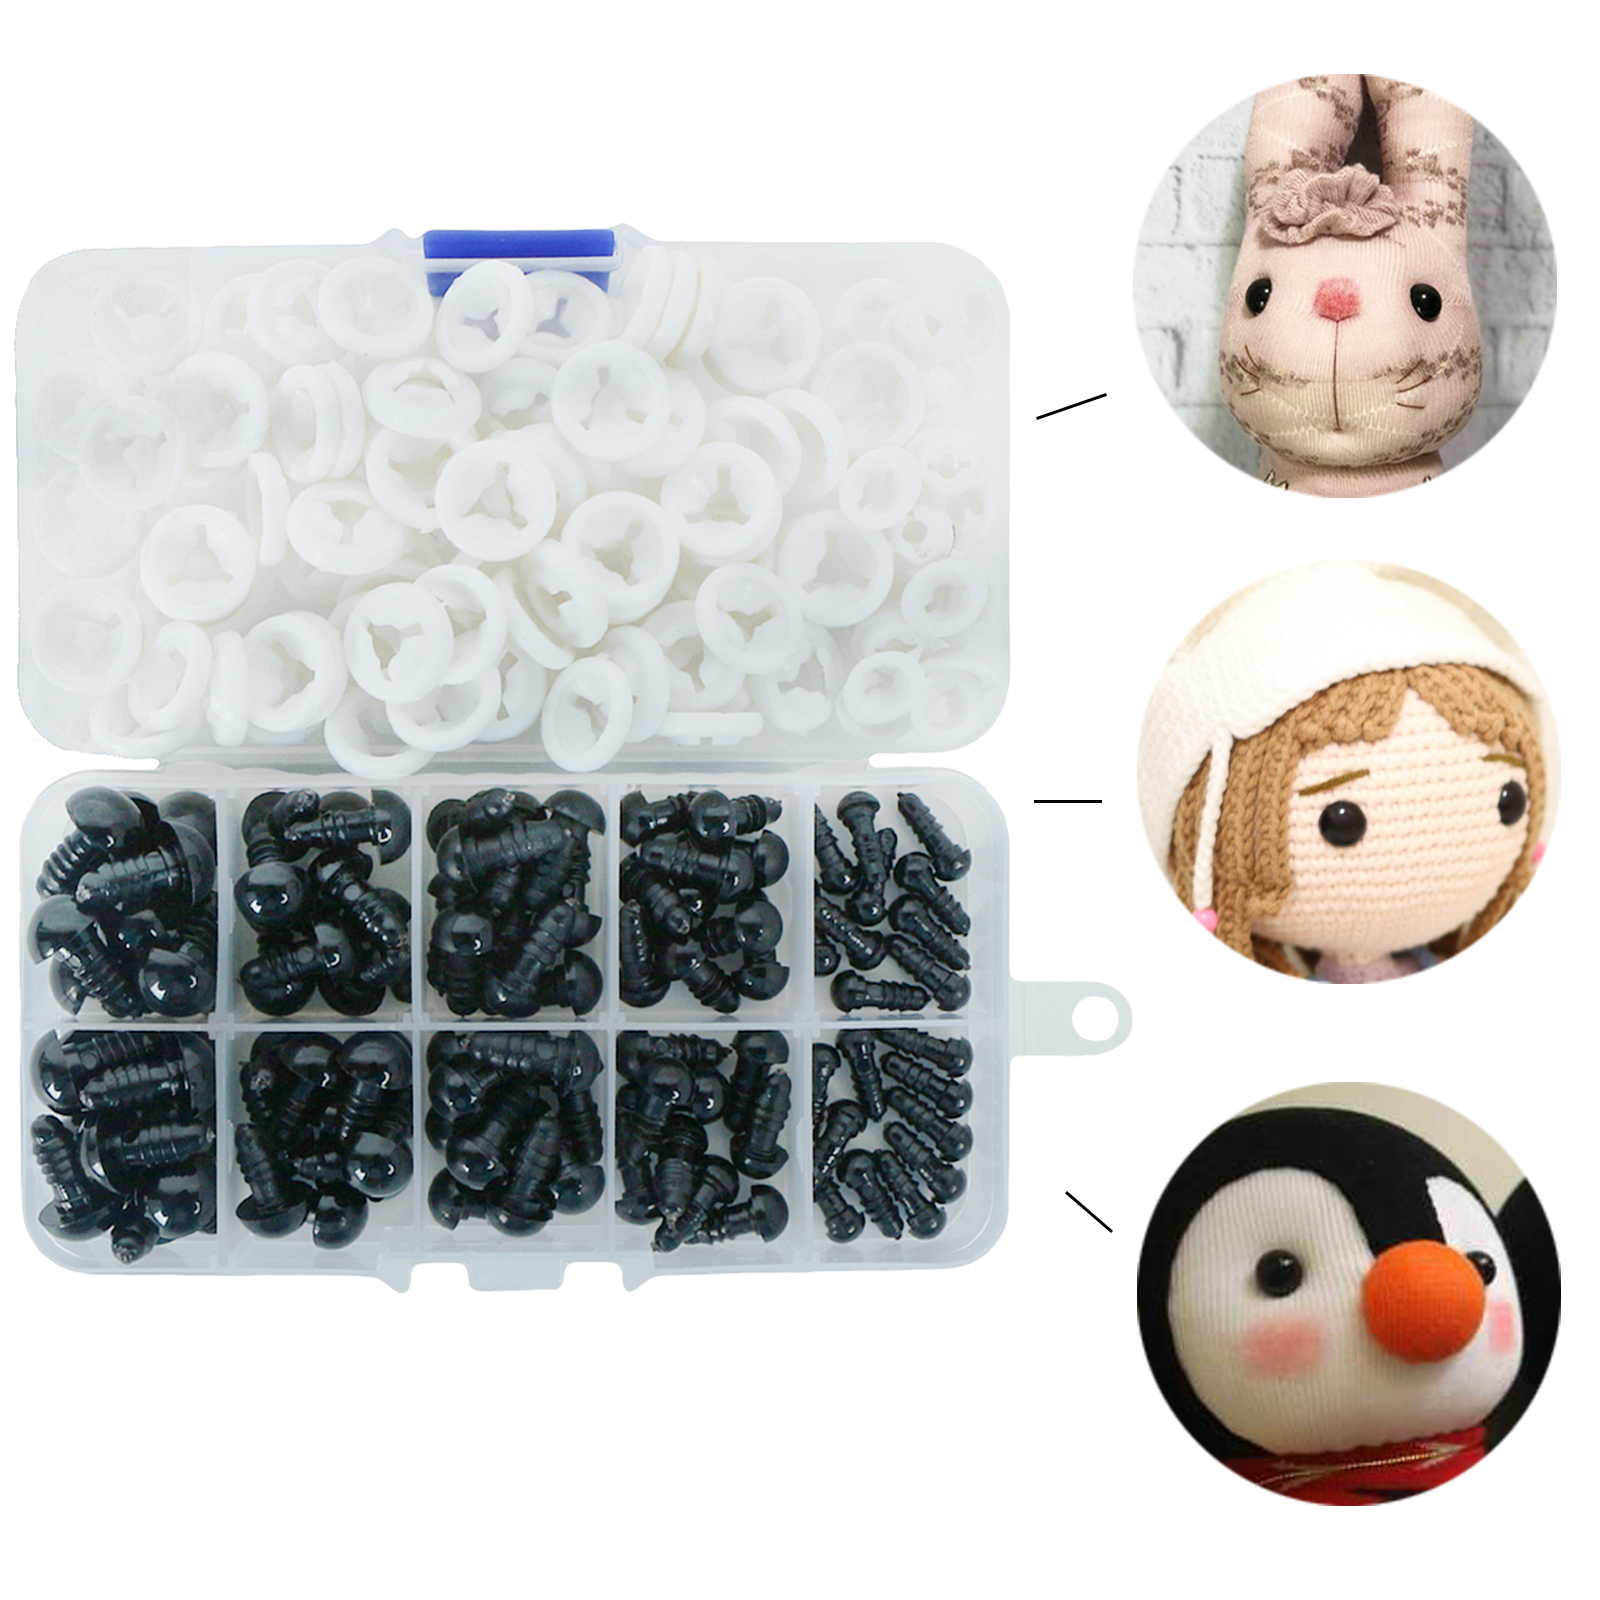 100pcs 6-12mm Black Plastic Crafts Safety Eyes For Bear Cloth Doll Soft Toy Animal Doll Amigurumi With Box DIY Accessories